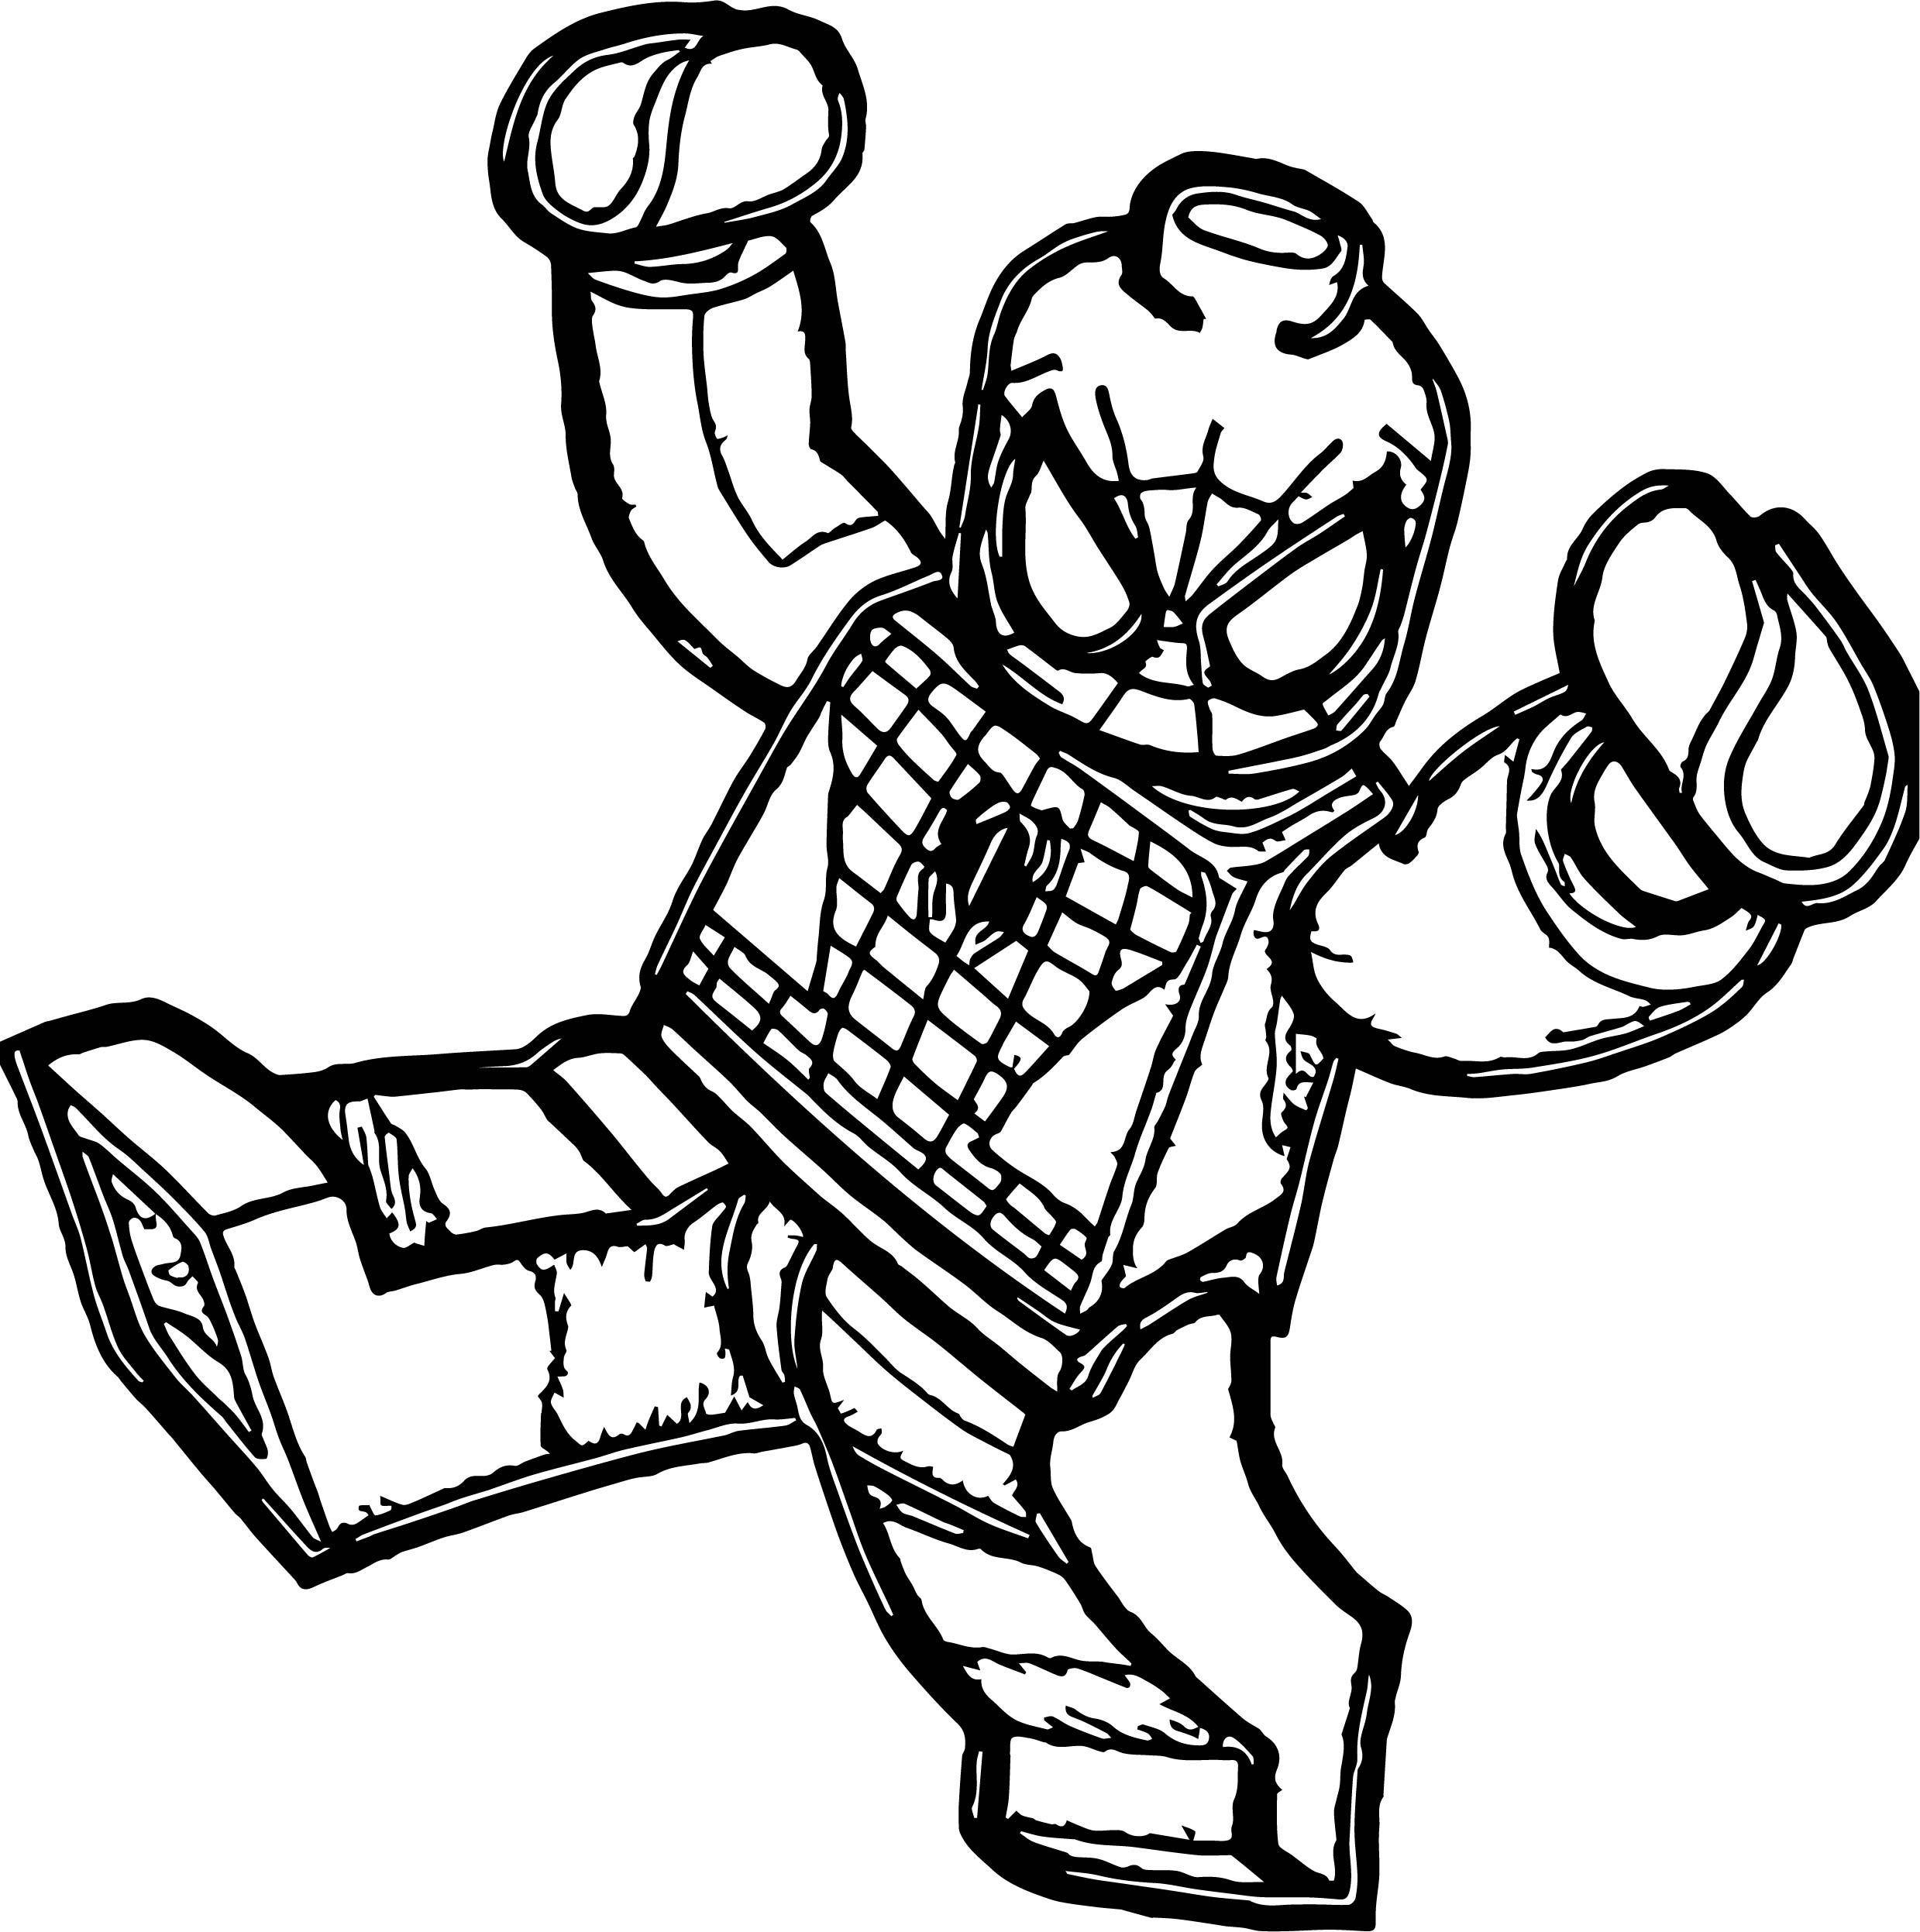 Venom Coloring Pages Lego Venom Spider Marvel Heroes: Lego Spider Man Joy Coloring Page